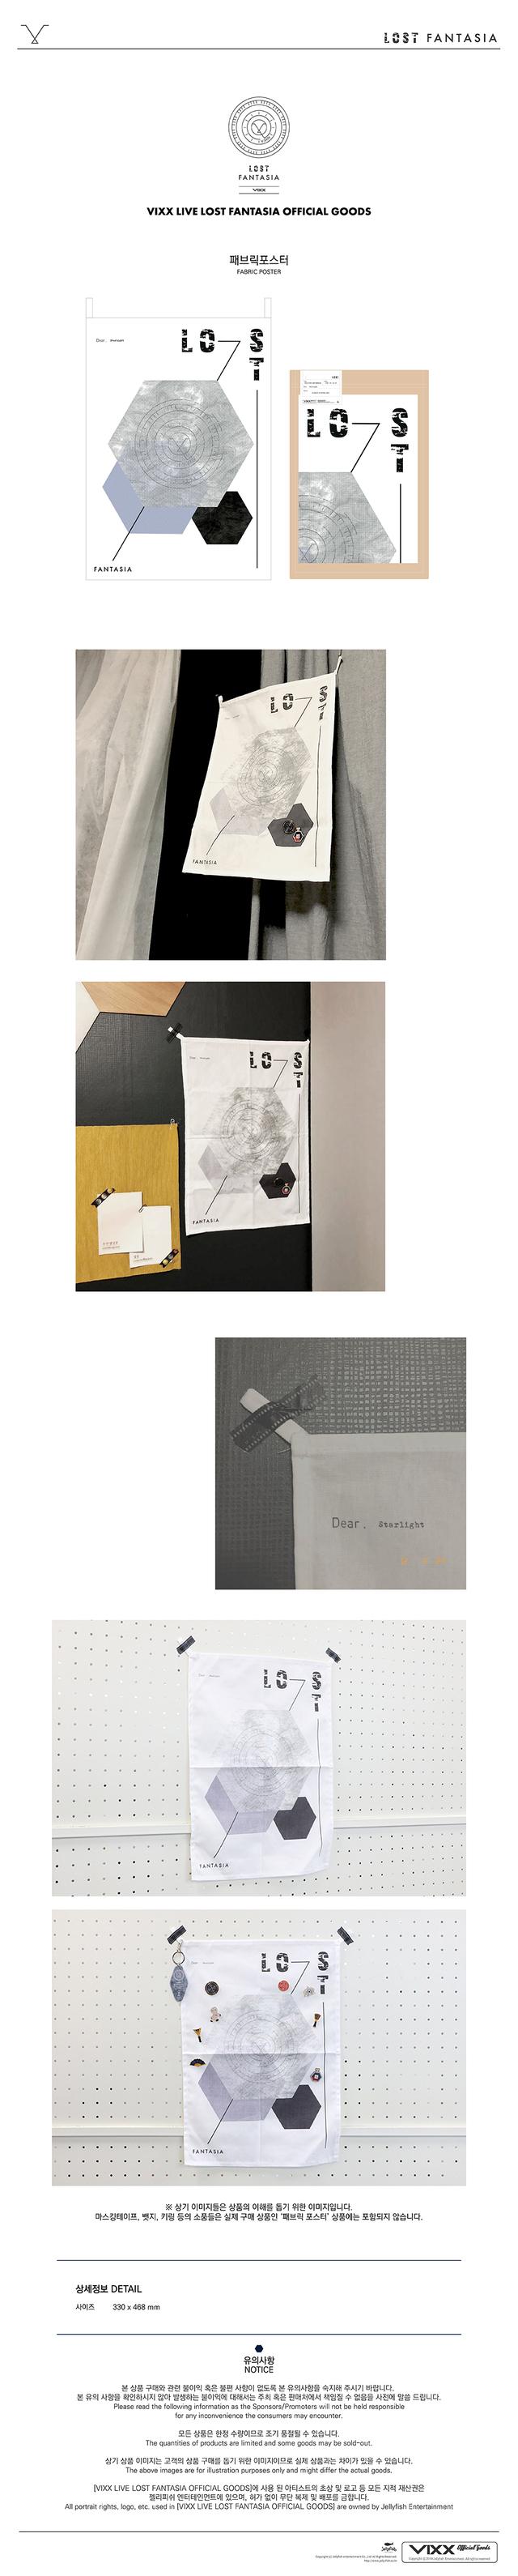 vixx_fabricposter.jpg